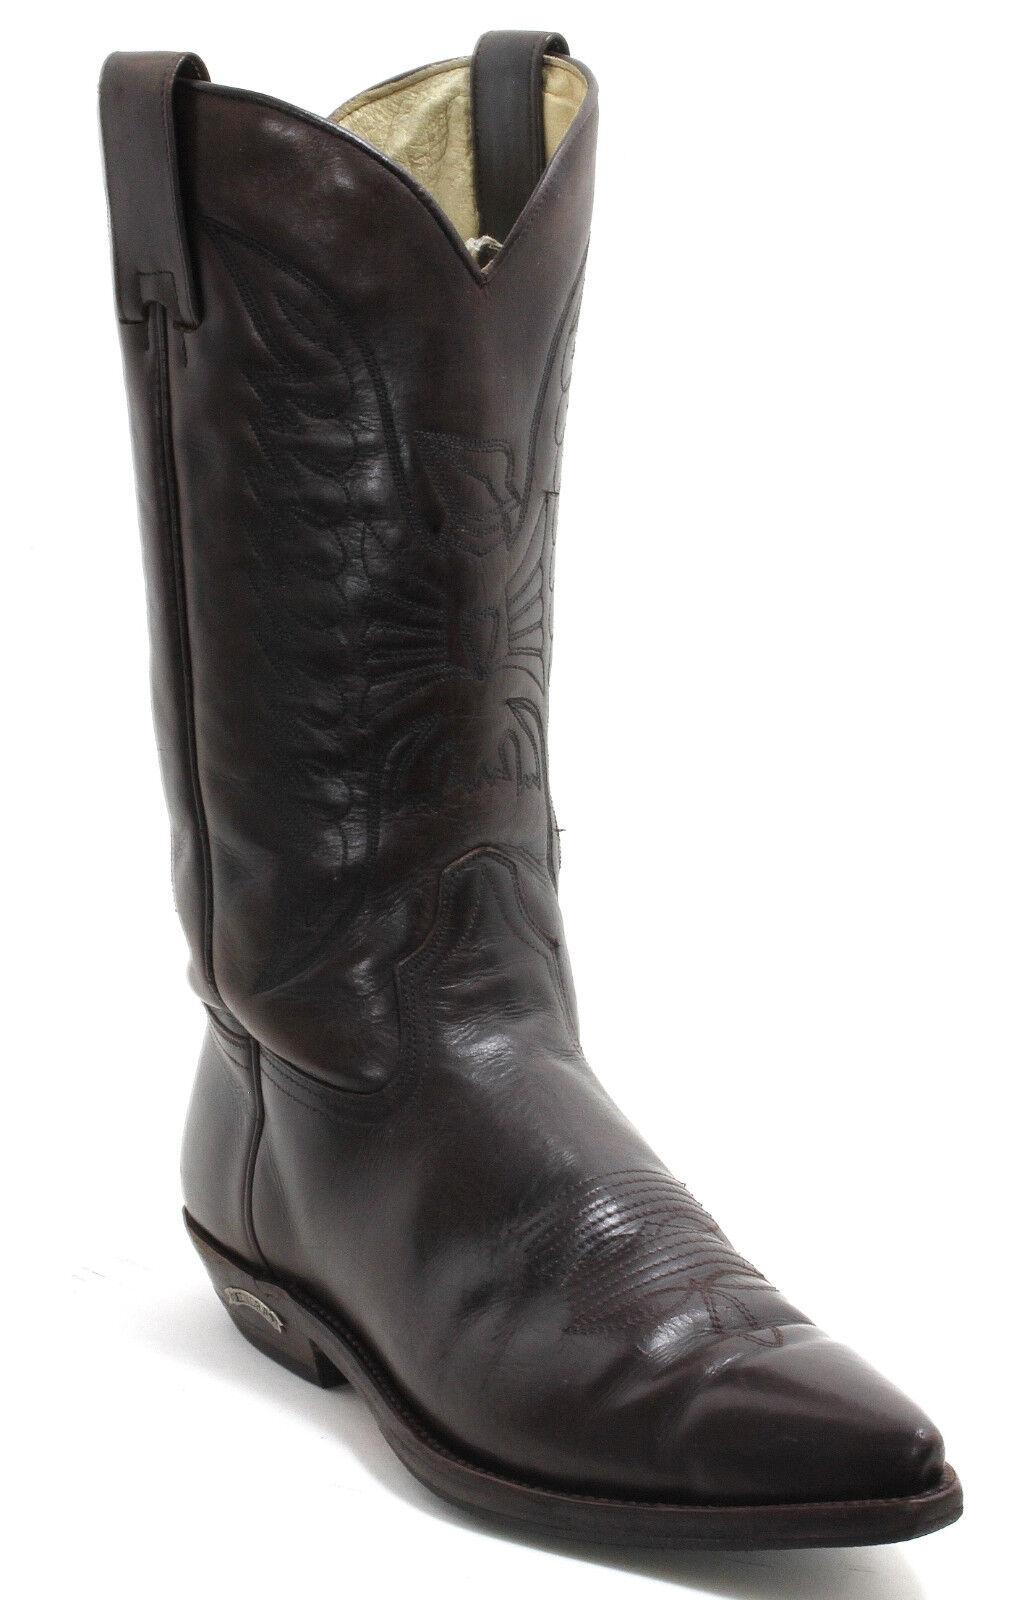 Western botas botas de vaquero solchaga style line Dance texas botas SENDRA 42,5